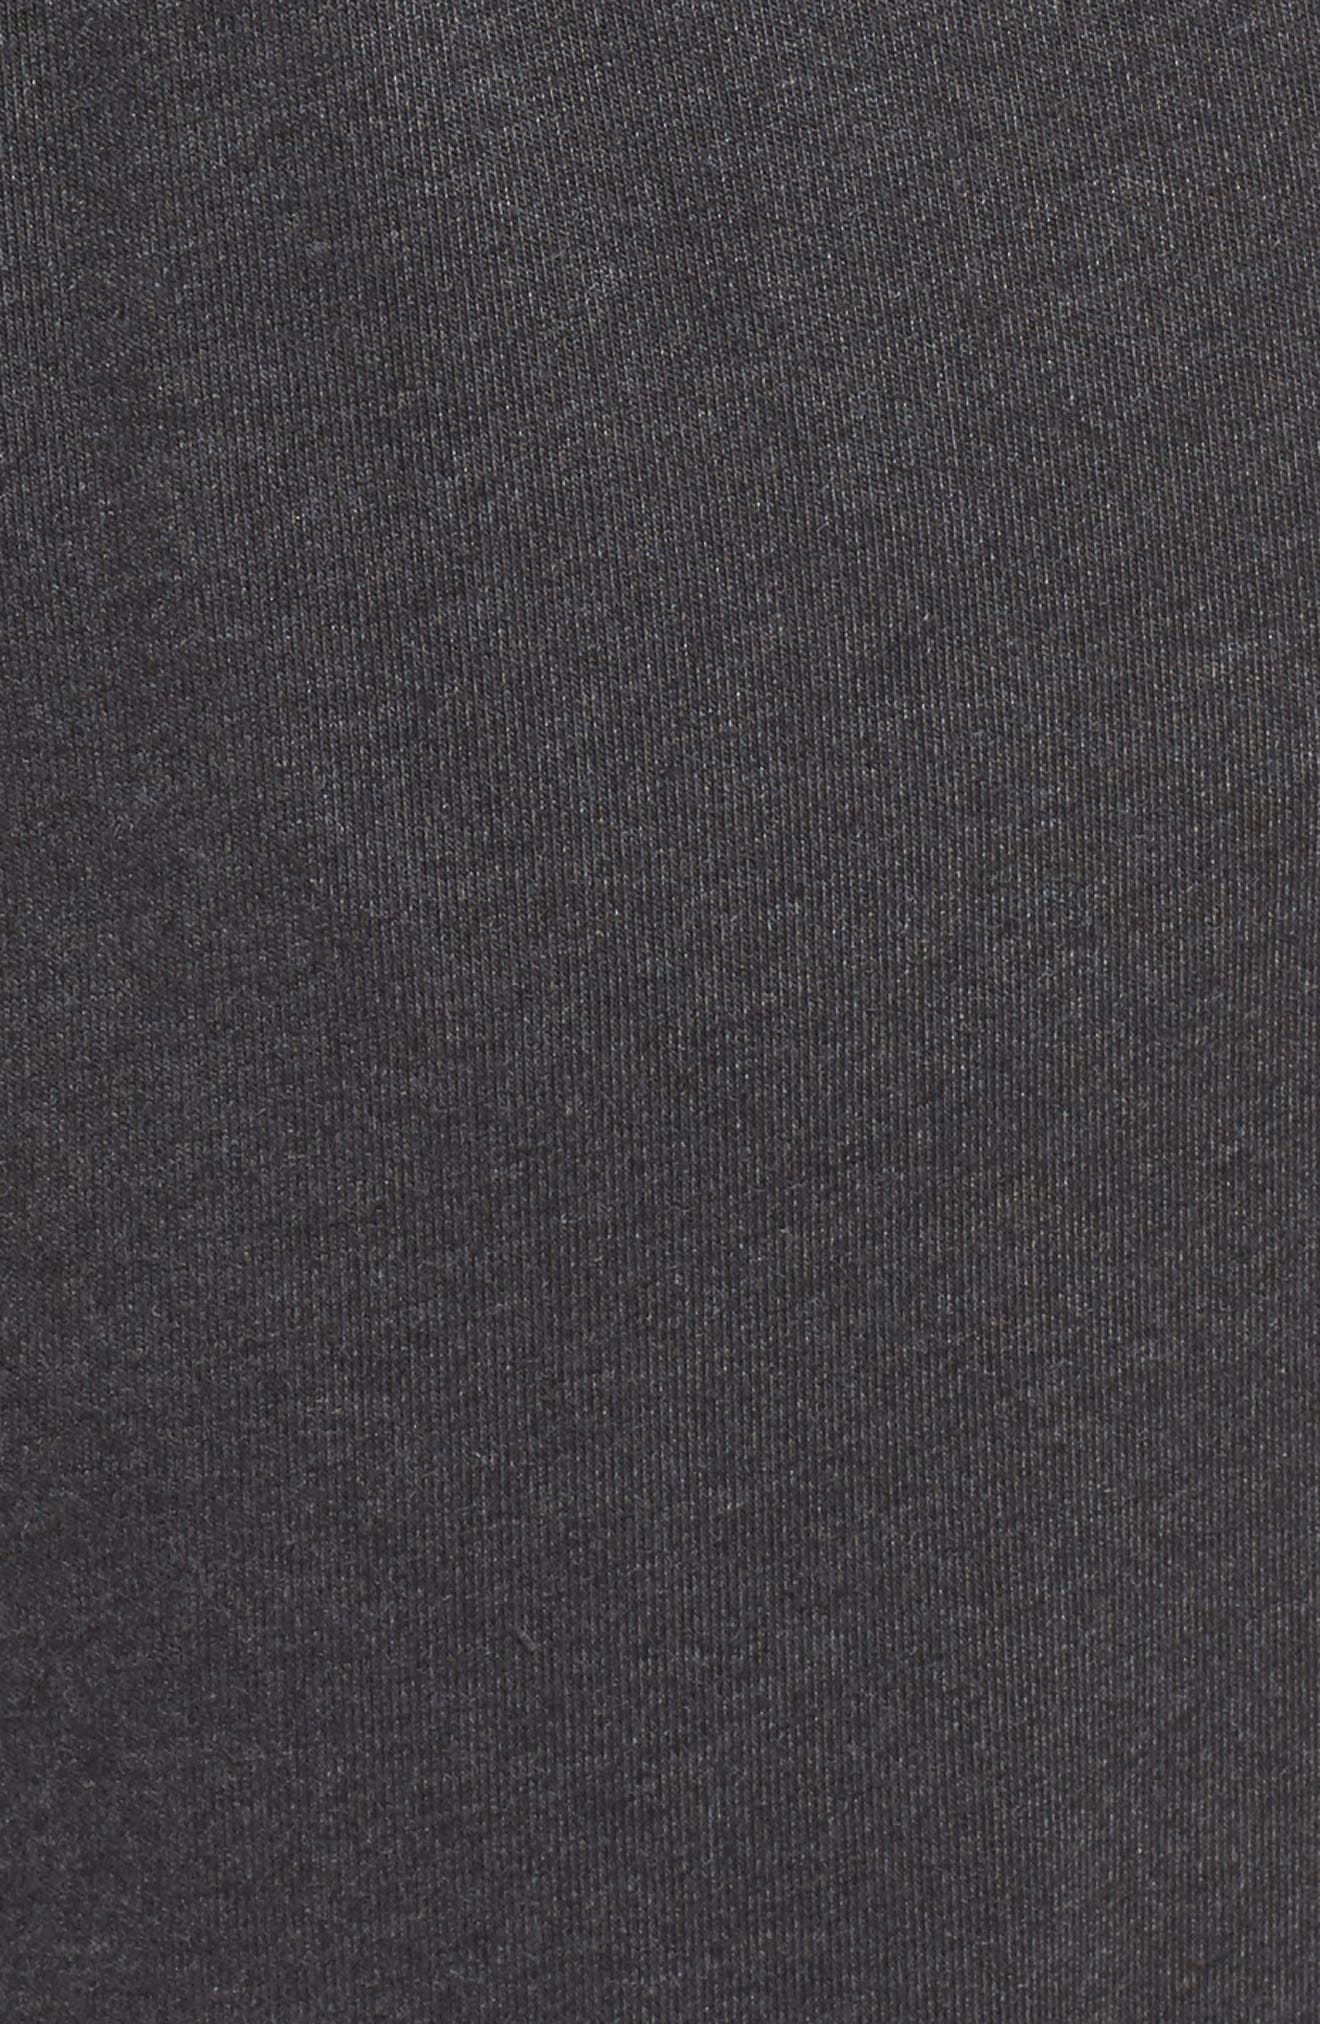 Sportswear Gym Capris,                             Alternate thumbnail 5, color,                             Black Heather/ Sail